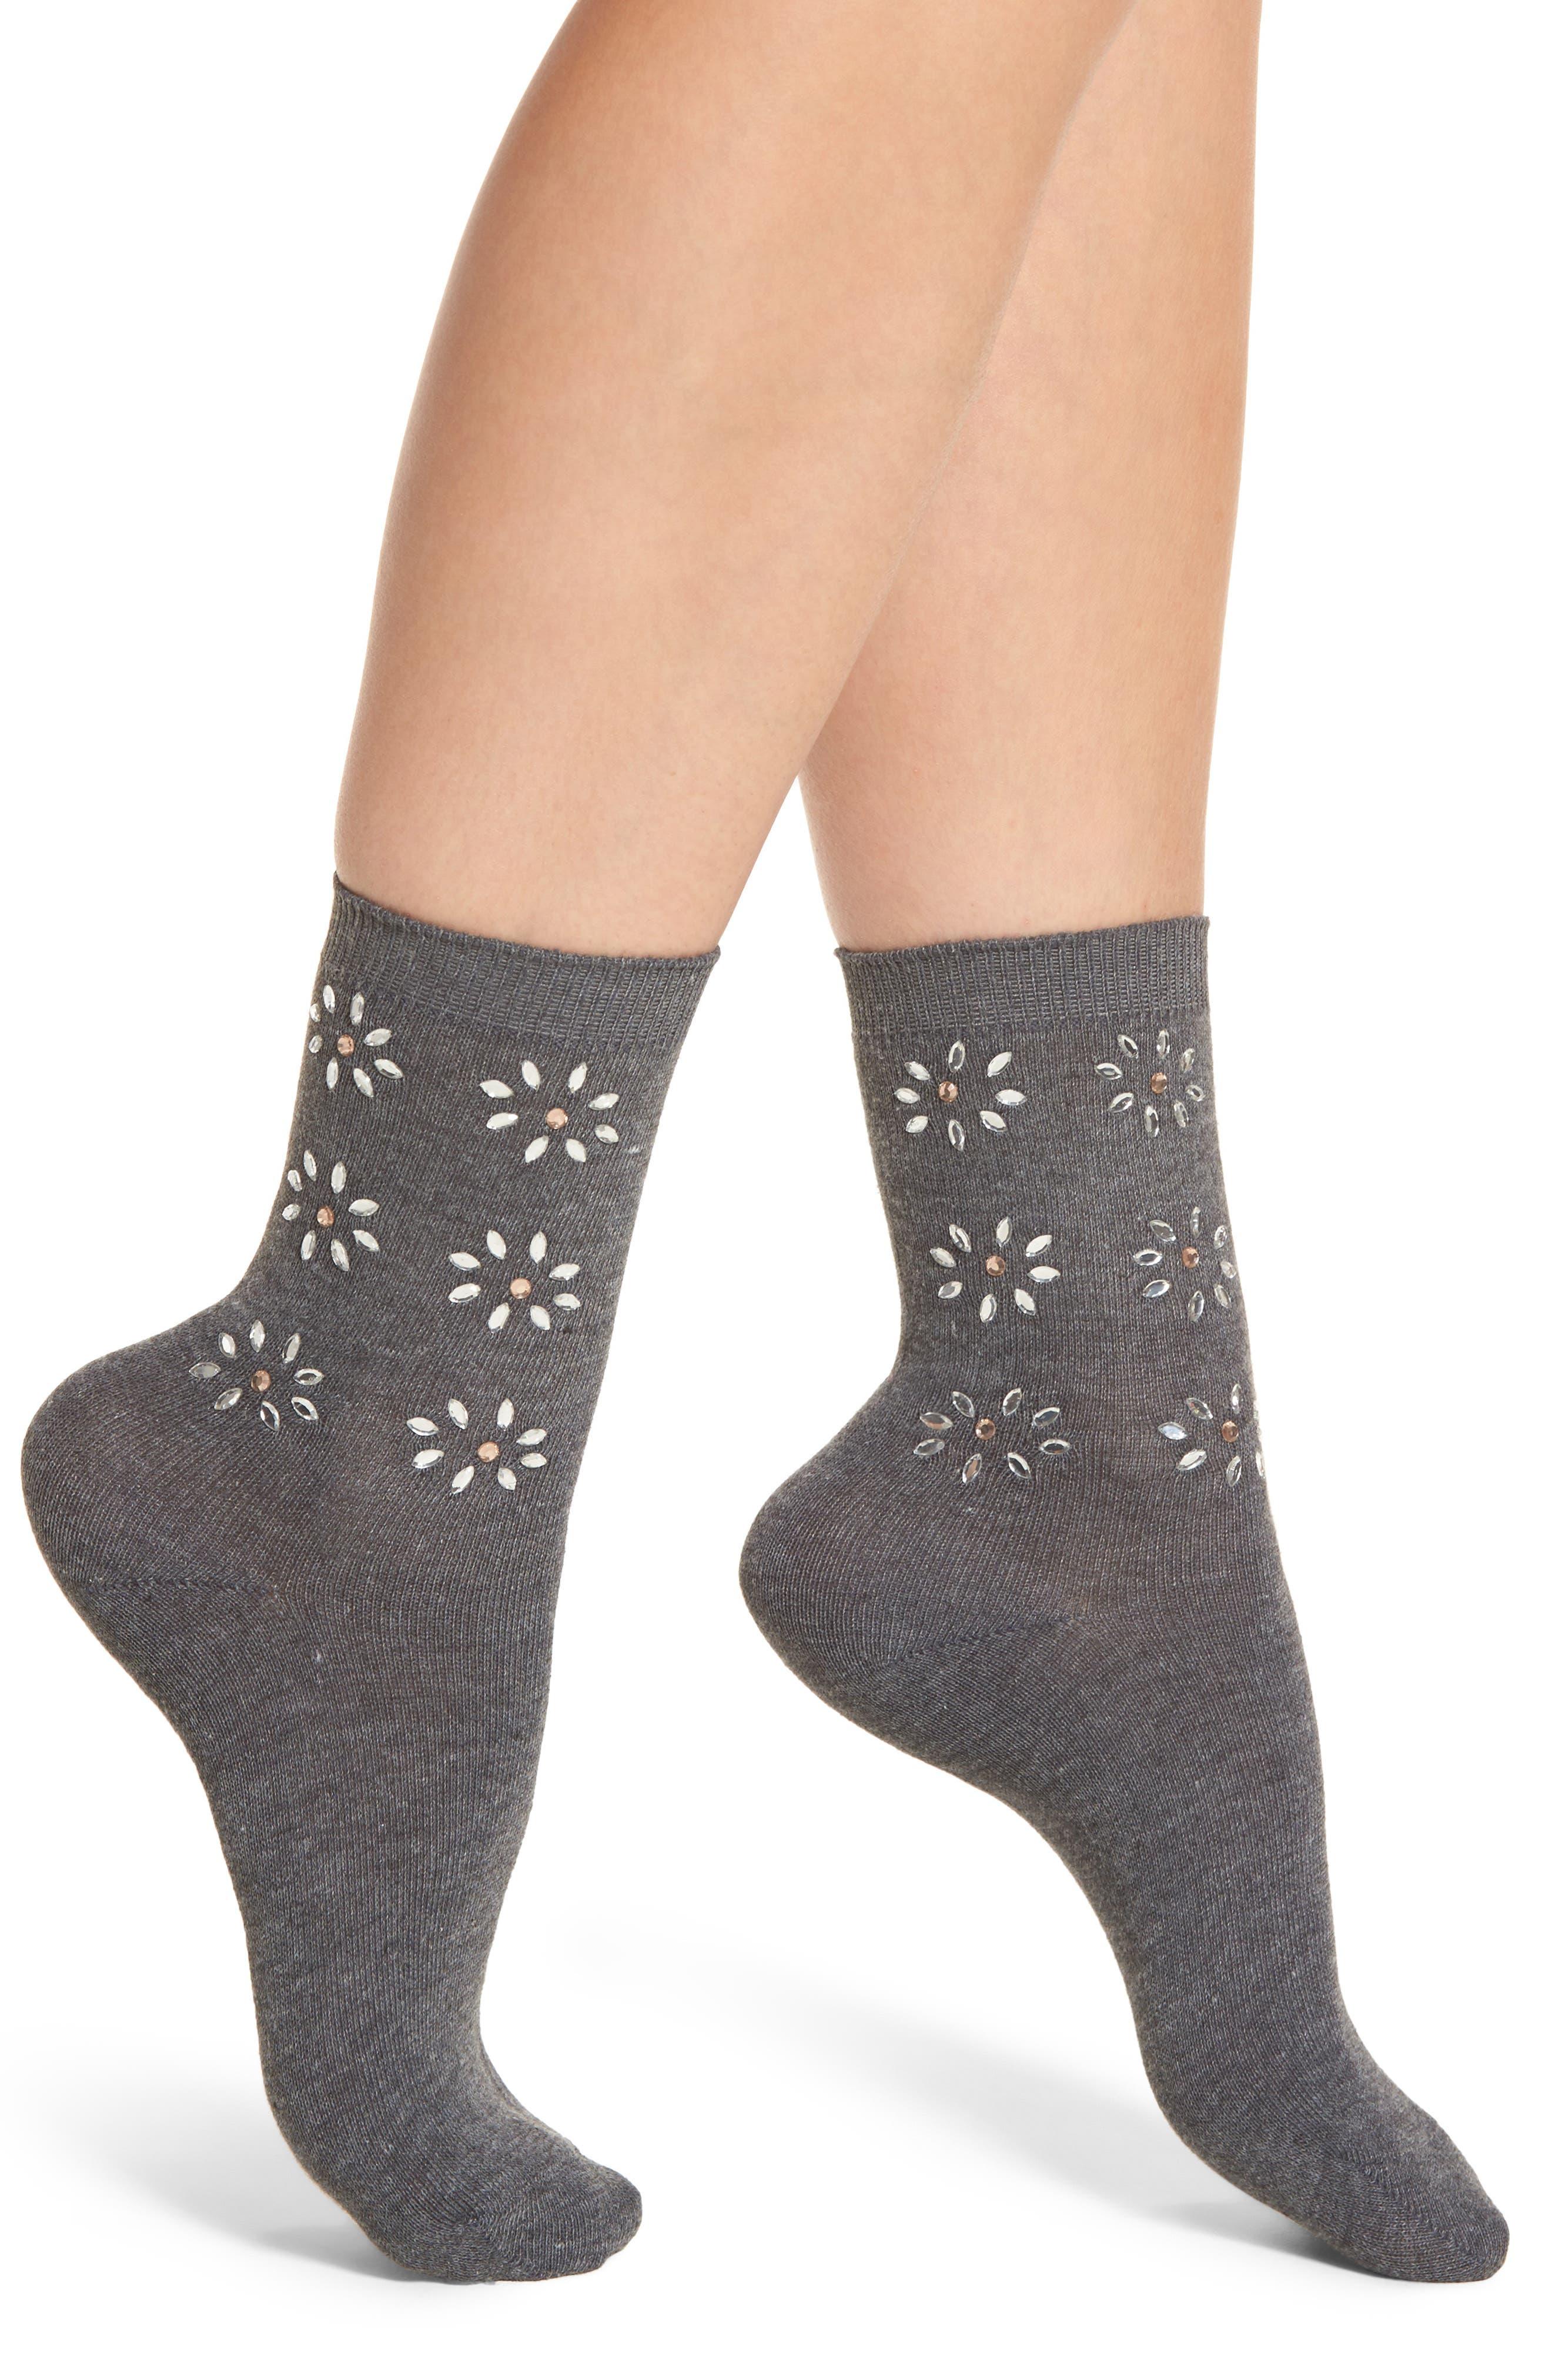 Crystal Flower Crew Socks,                             Main thumbnail 1, color,                             020